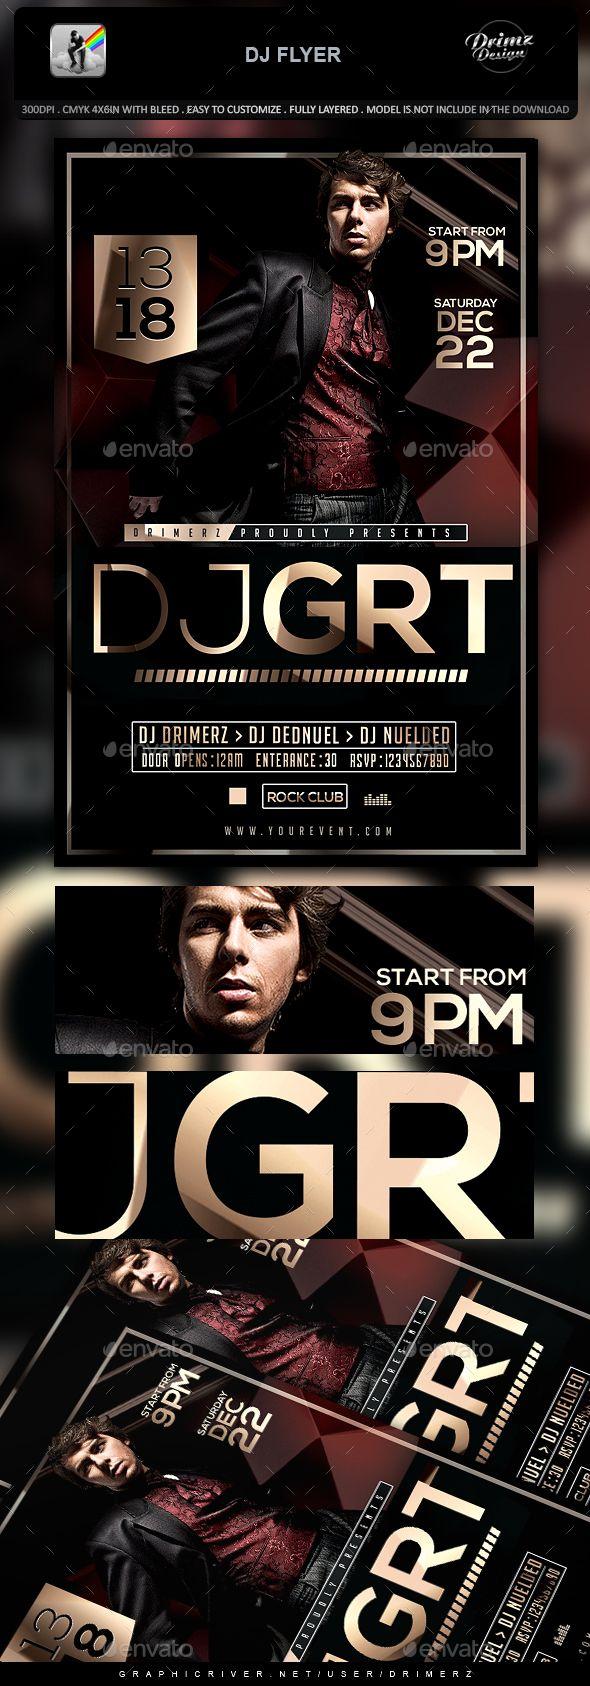 DJ Flyer   Pinterest   Dj, Event flyers and Flyer template